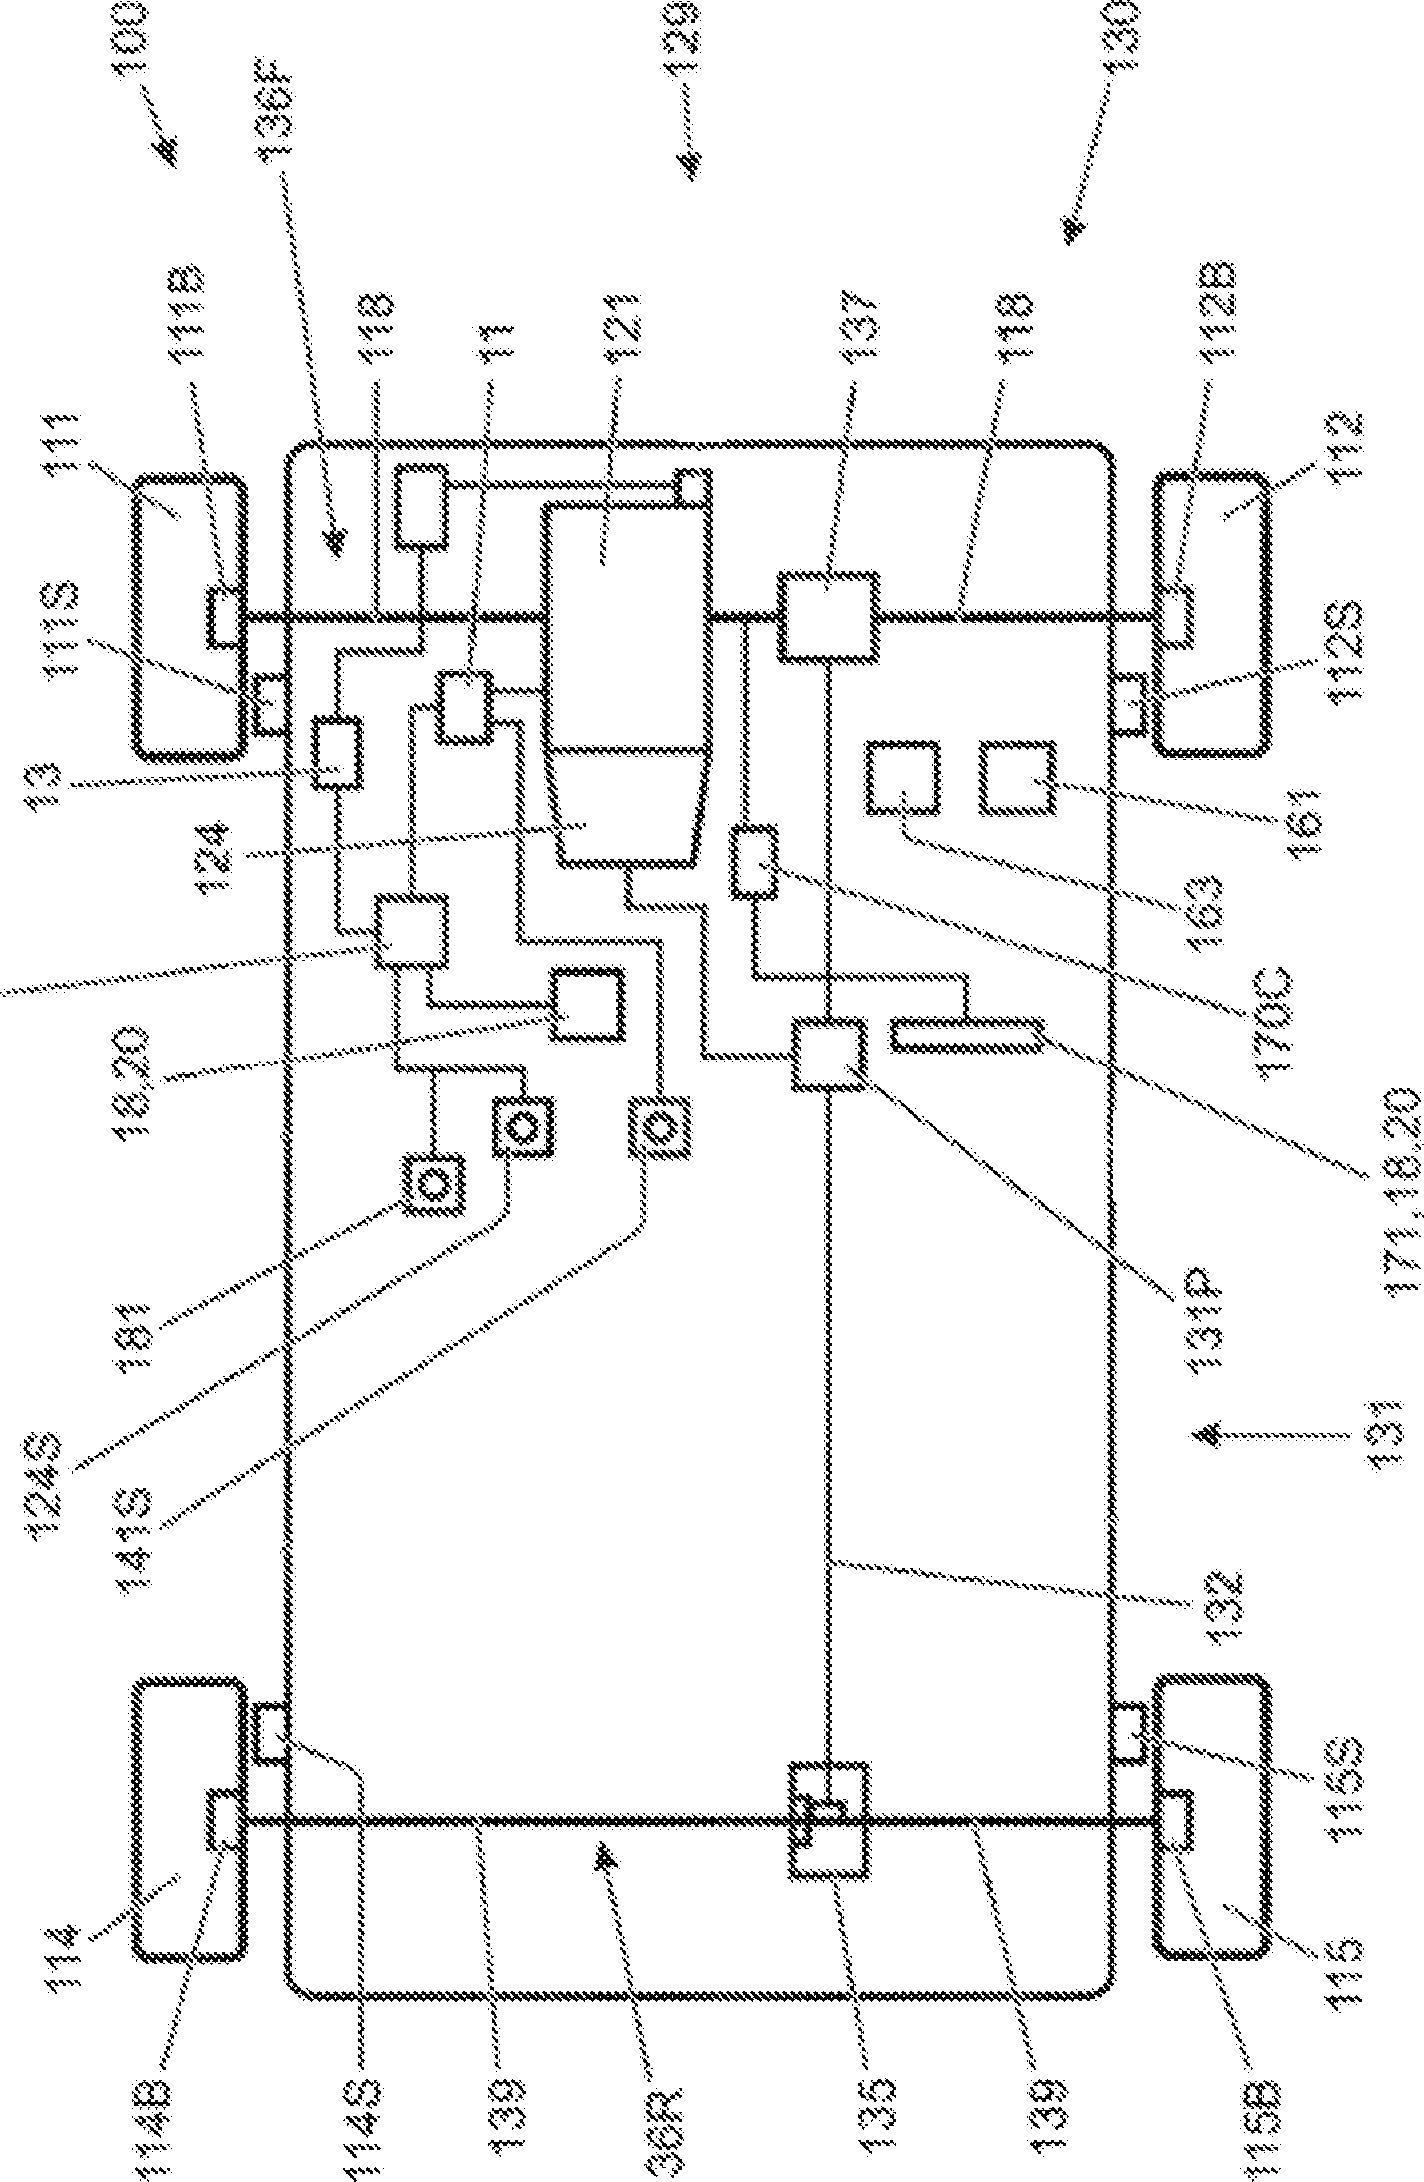 Figure GB2559168A_D0002